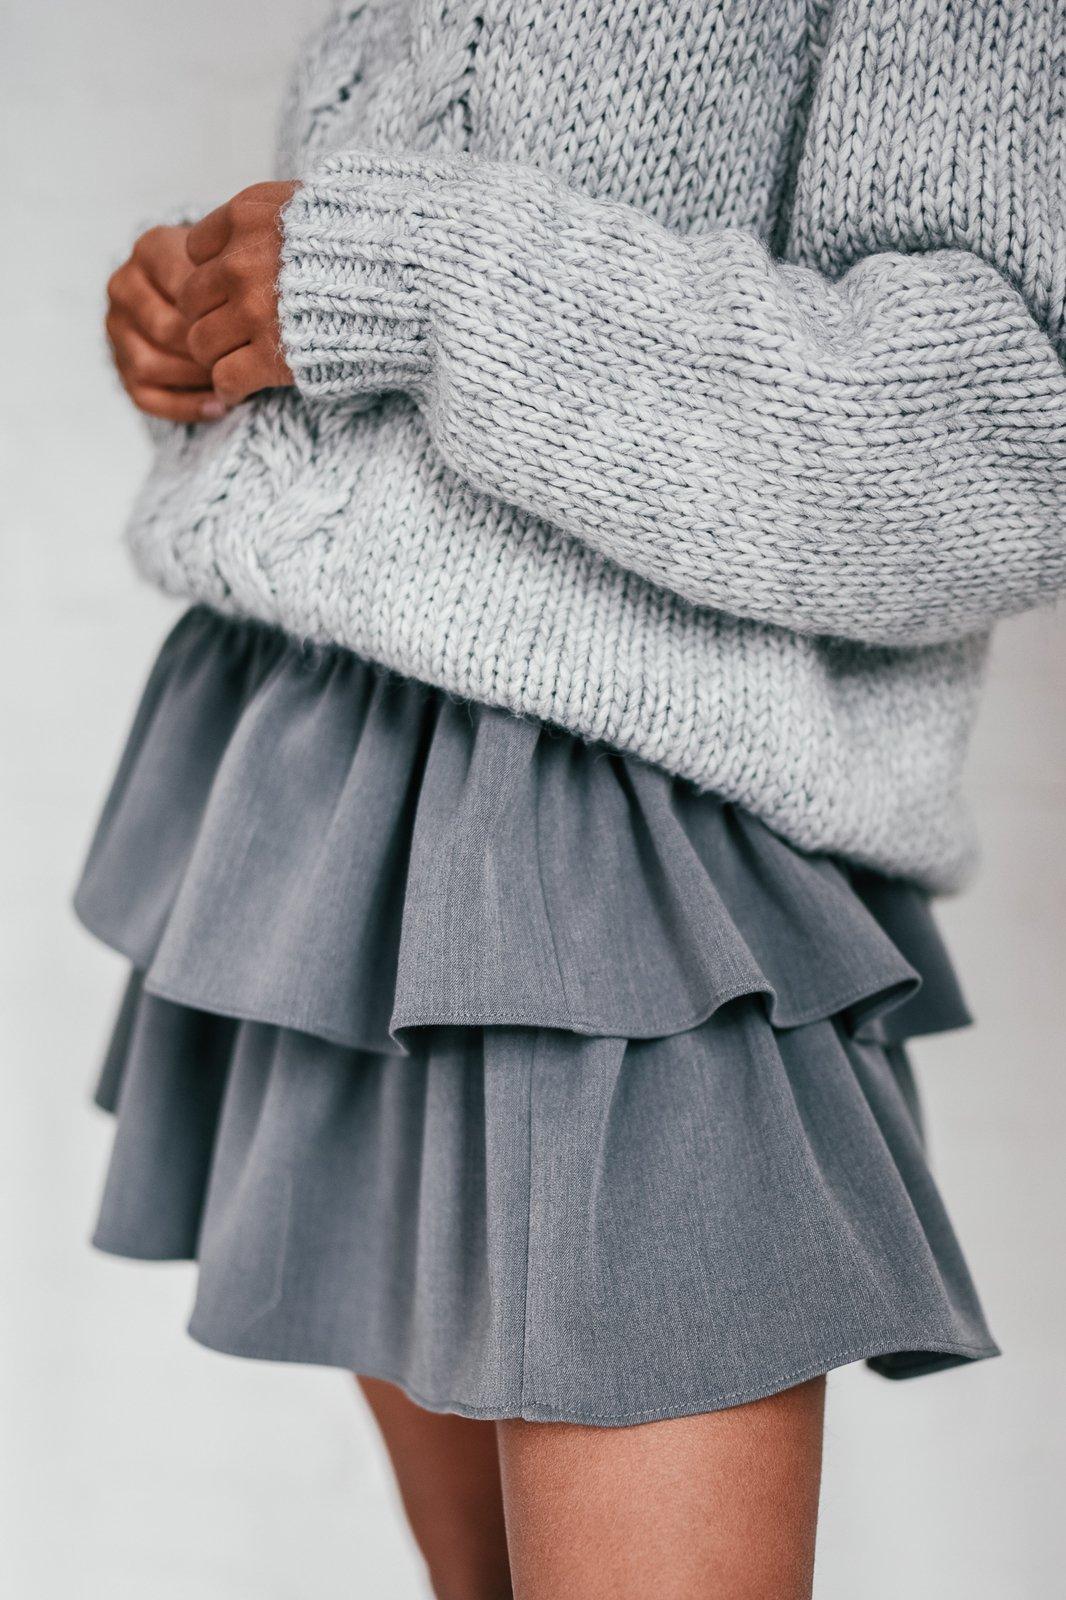 CHEAP Naya Stone Skirt 28617024019 – Women's Dresses & Skirts